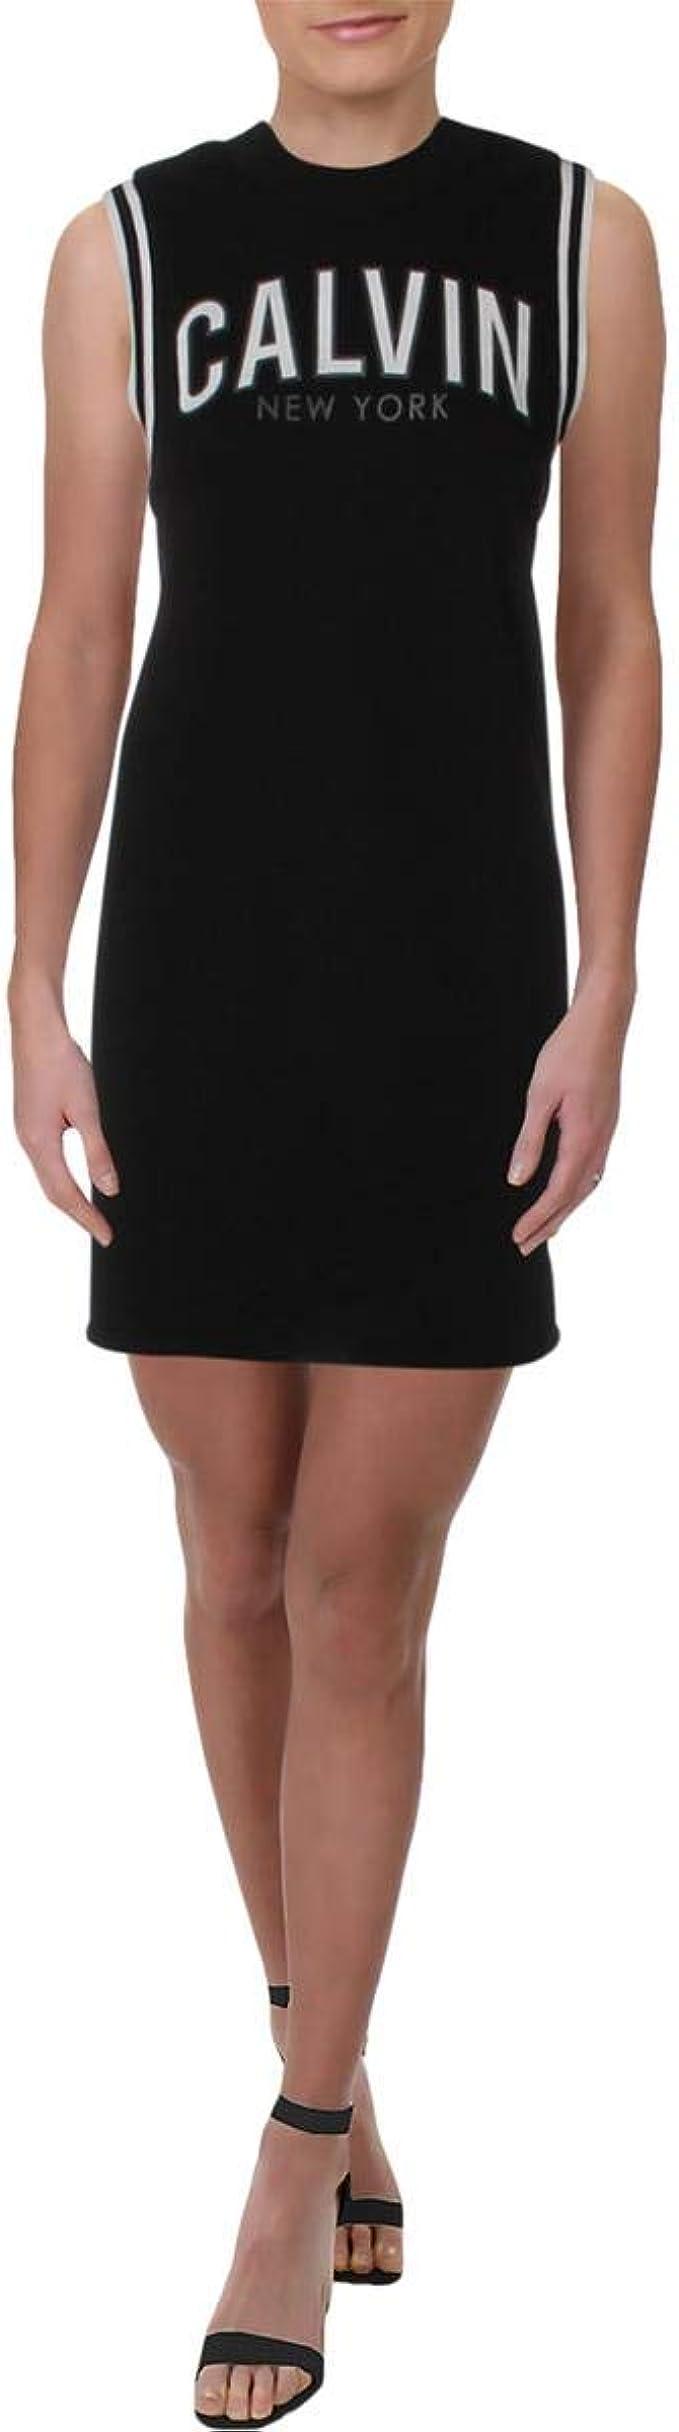 Calvin Klein Damen Sweatshirt Dress Athletic Rib Trim Kleid ...